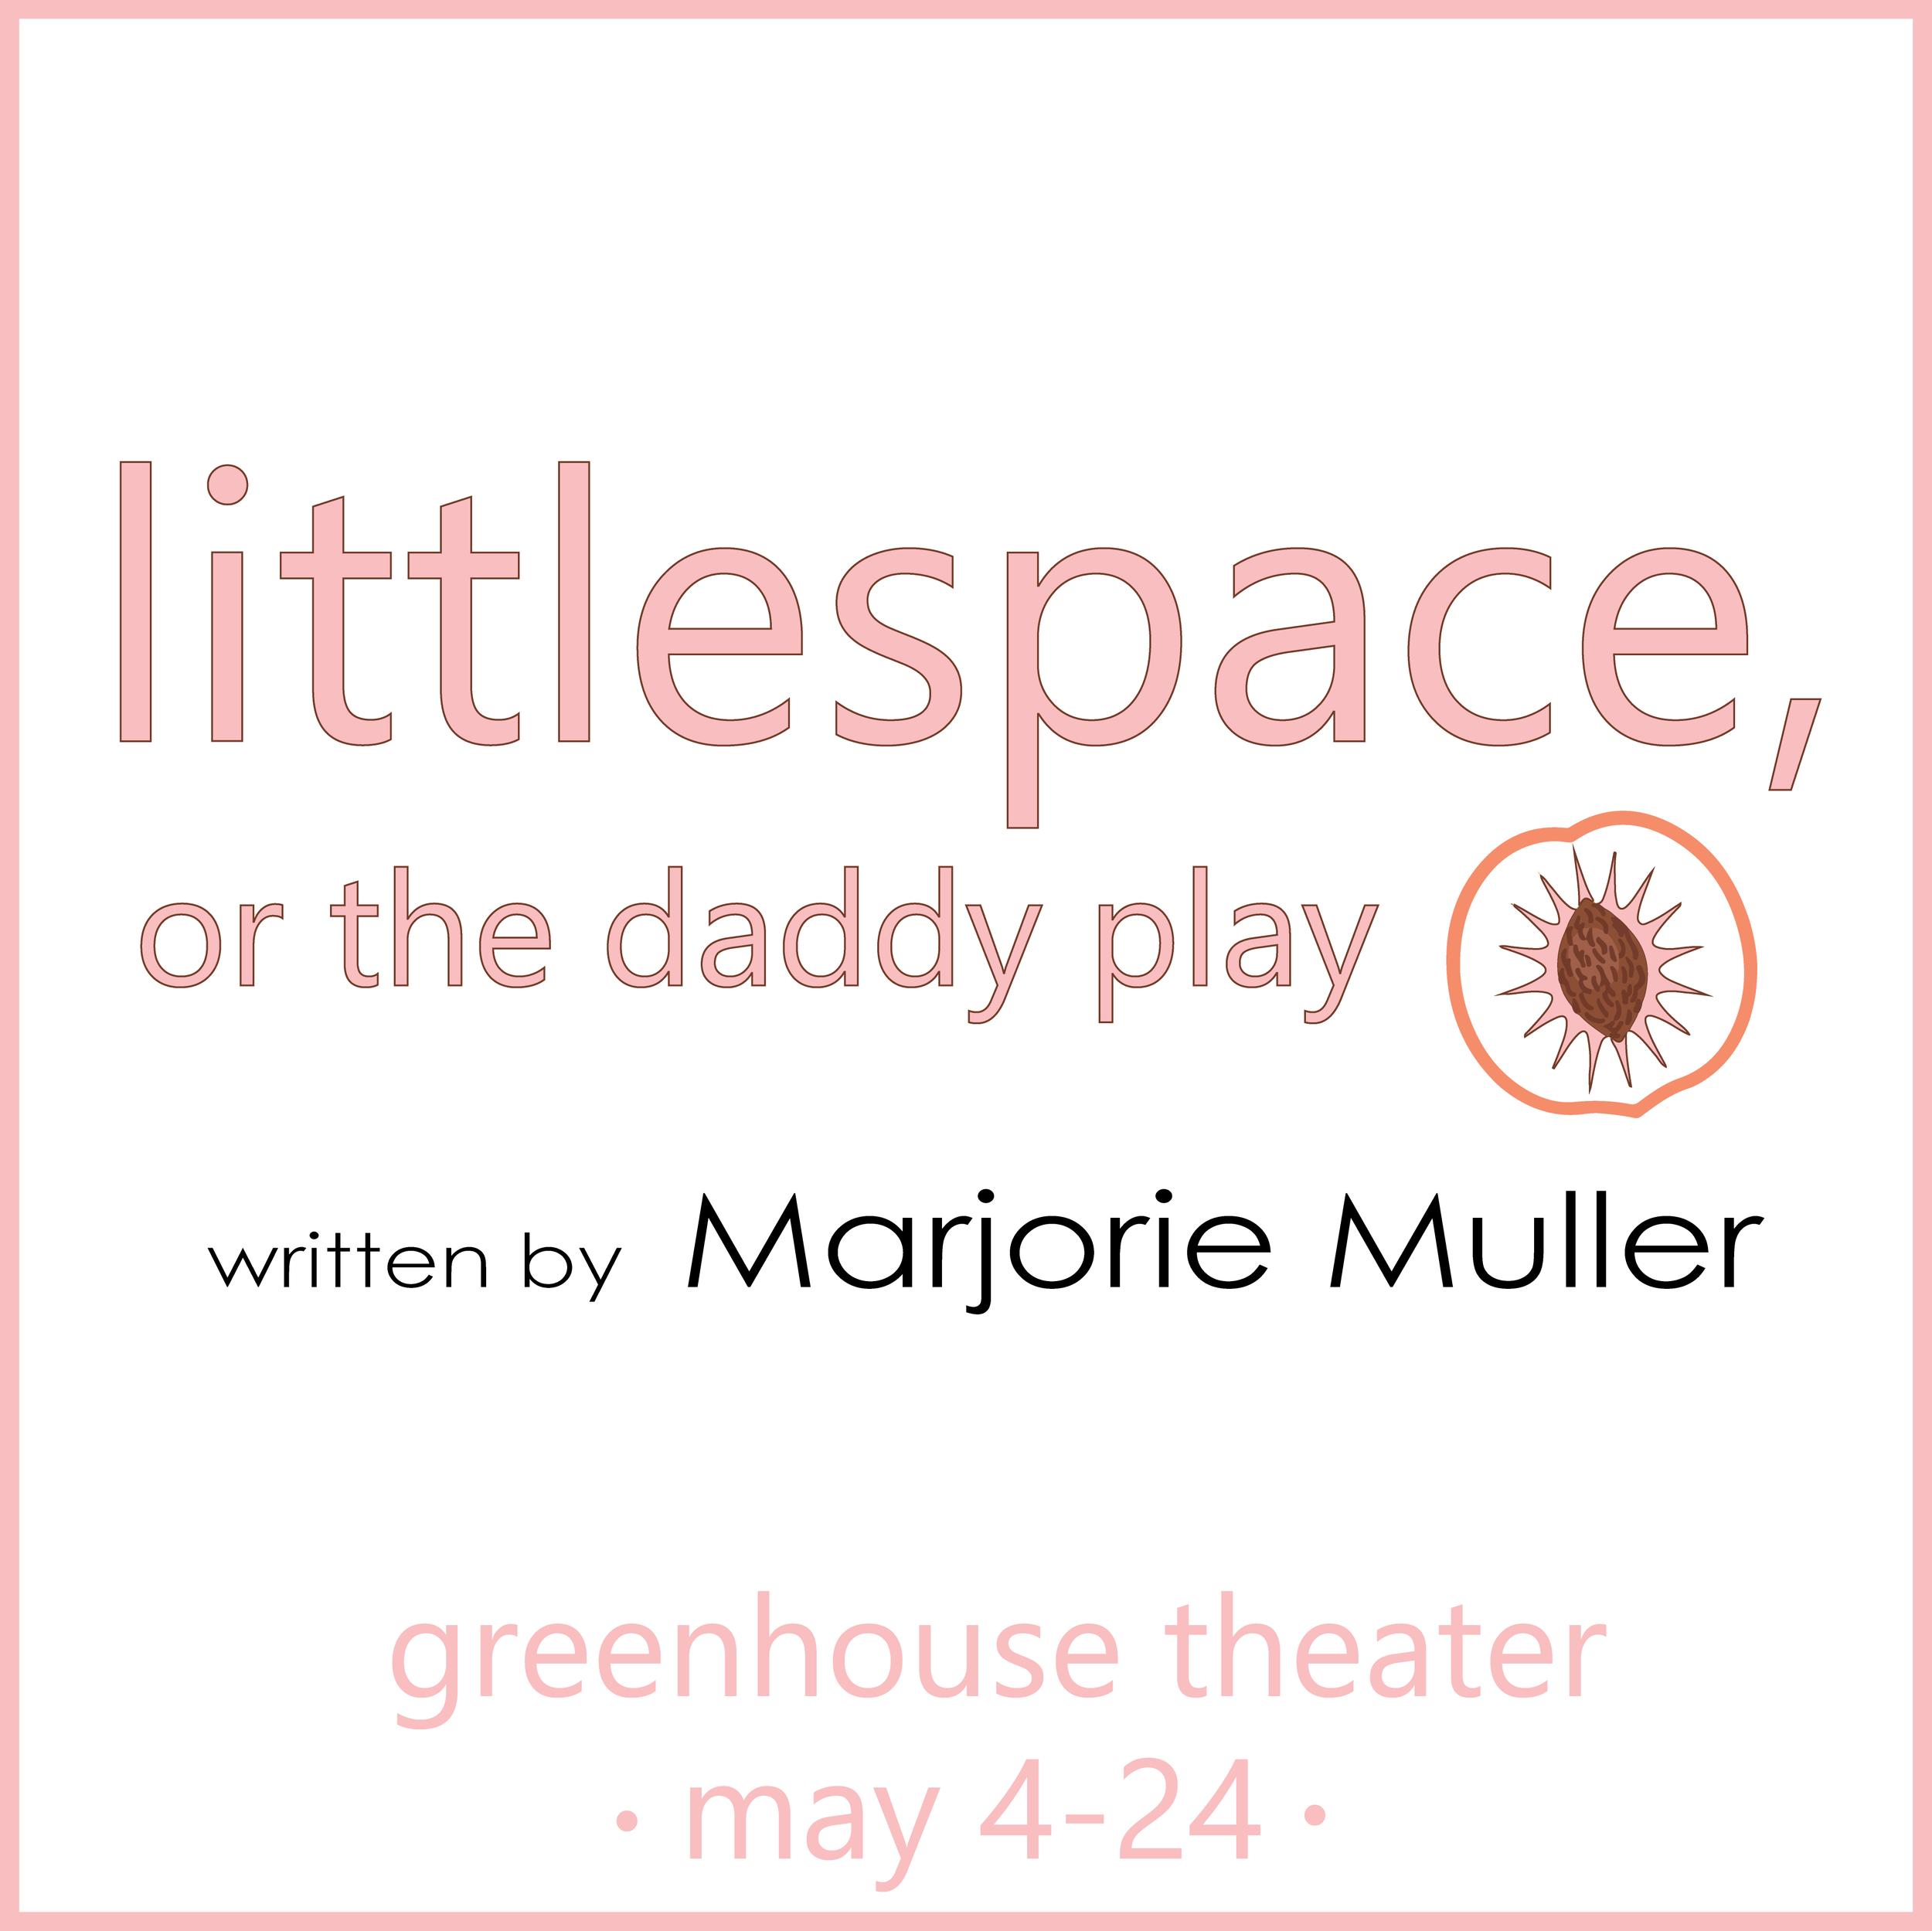 Laura Duncan (l) as Bea and Destini Huston (r) as Carrie Ann discuss motherhood and teeth.